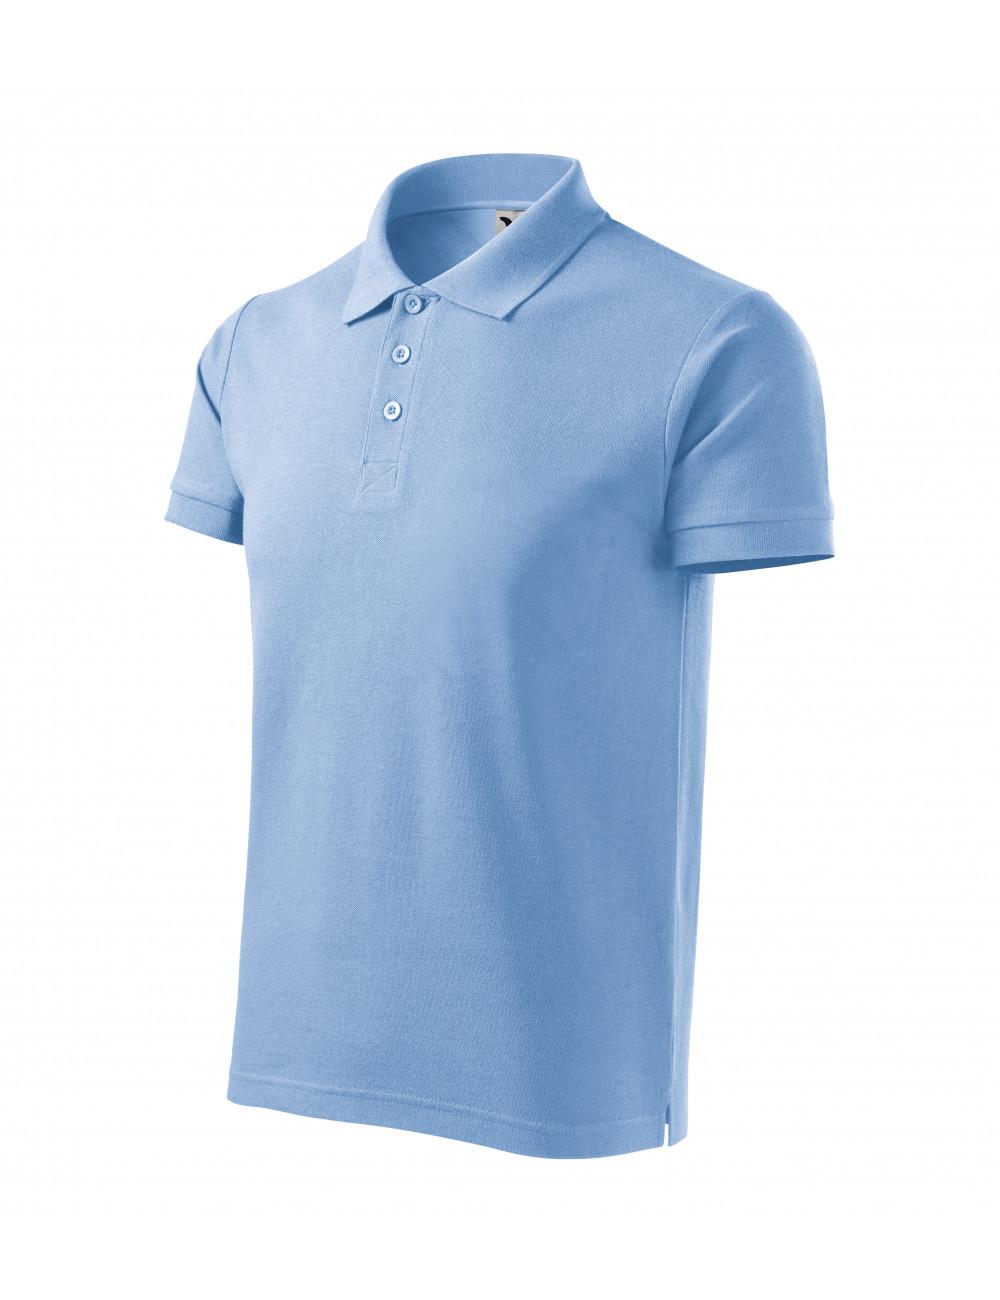 Adler MALFINI Koszulka polo męska Cotton Heavy 215 błękitny